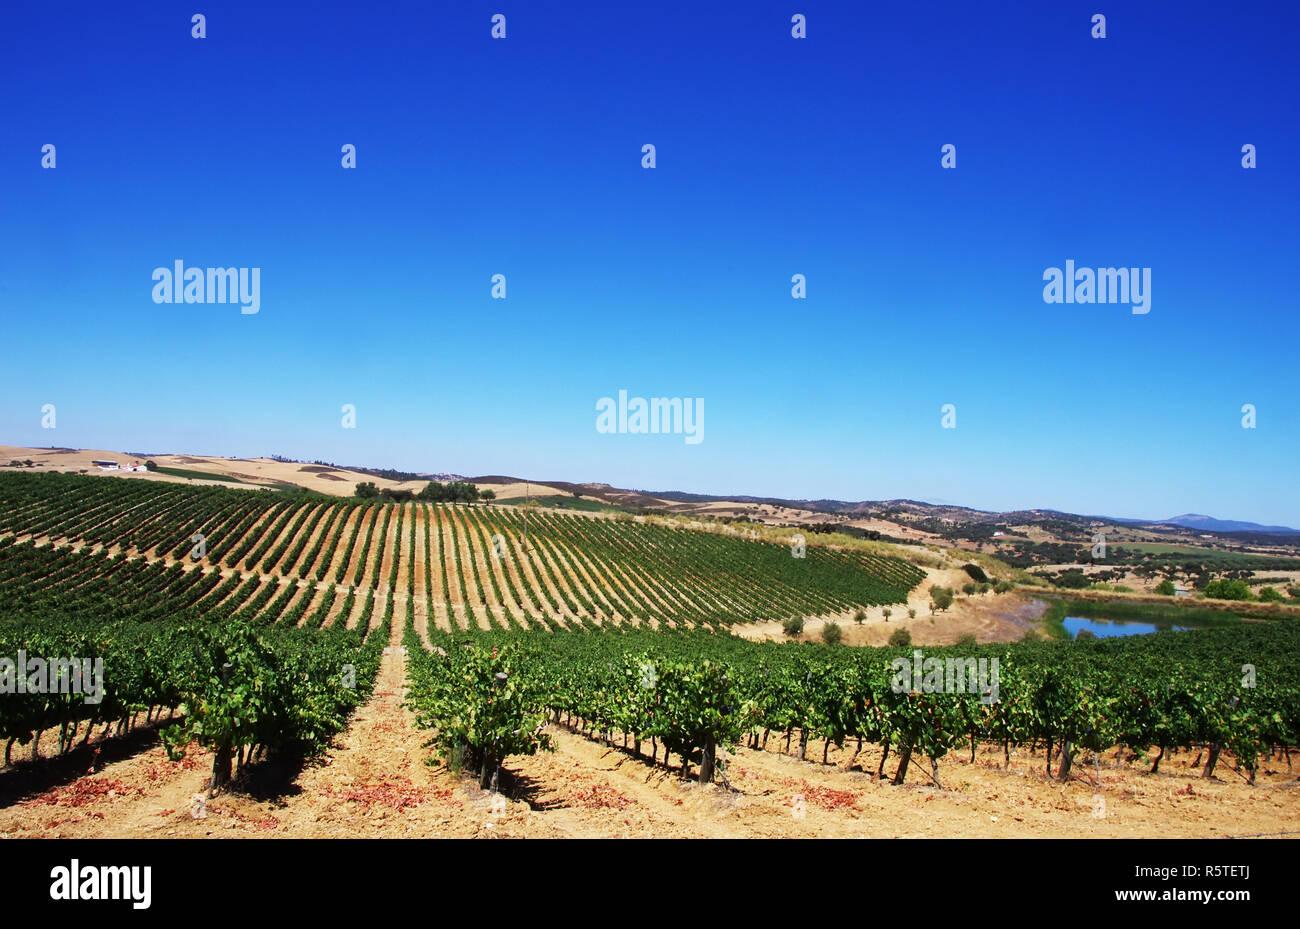 Vineyard at Alentejo region, south of  Portugal. Stock Photo